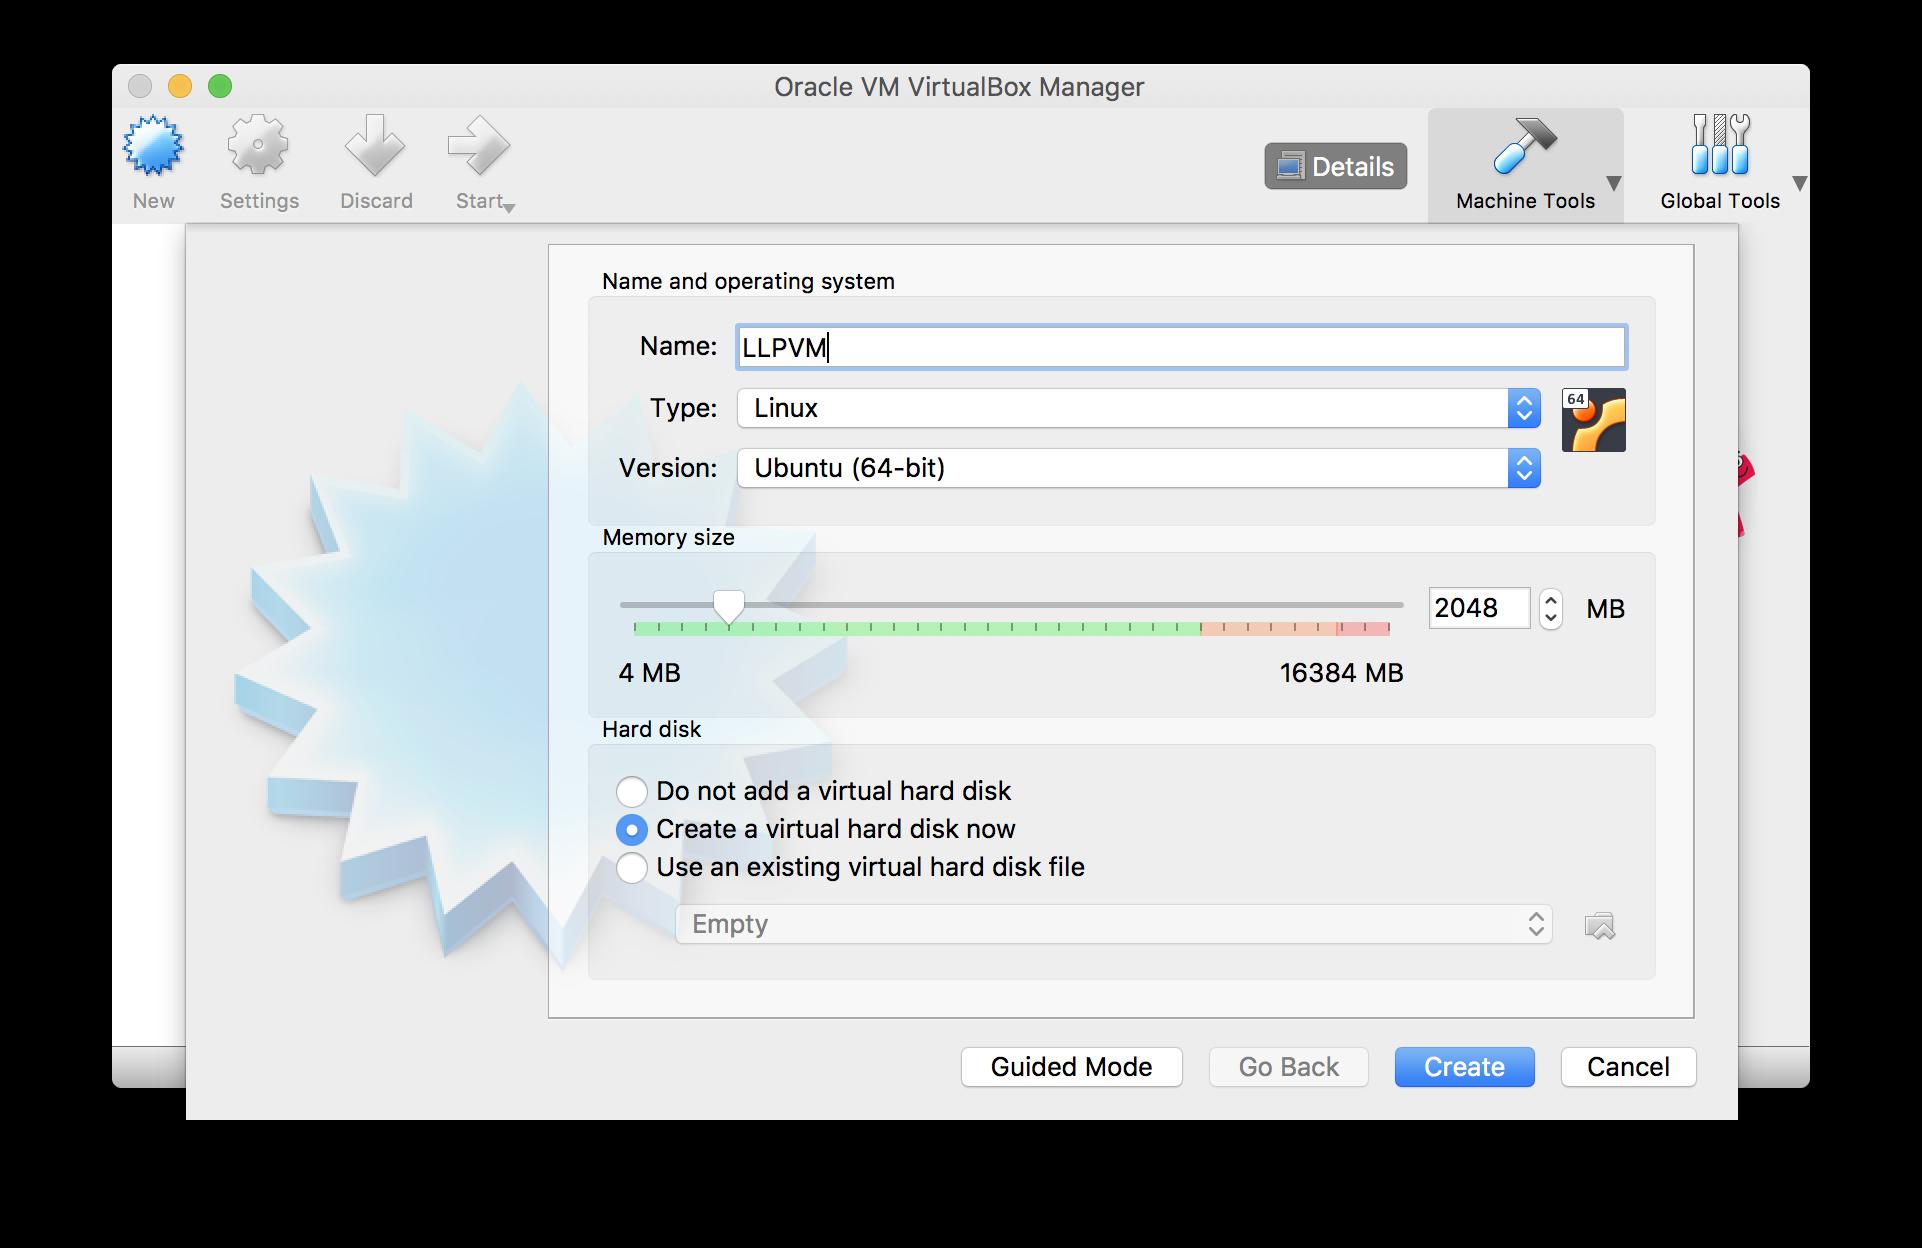 Configuring a Virtual Machine